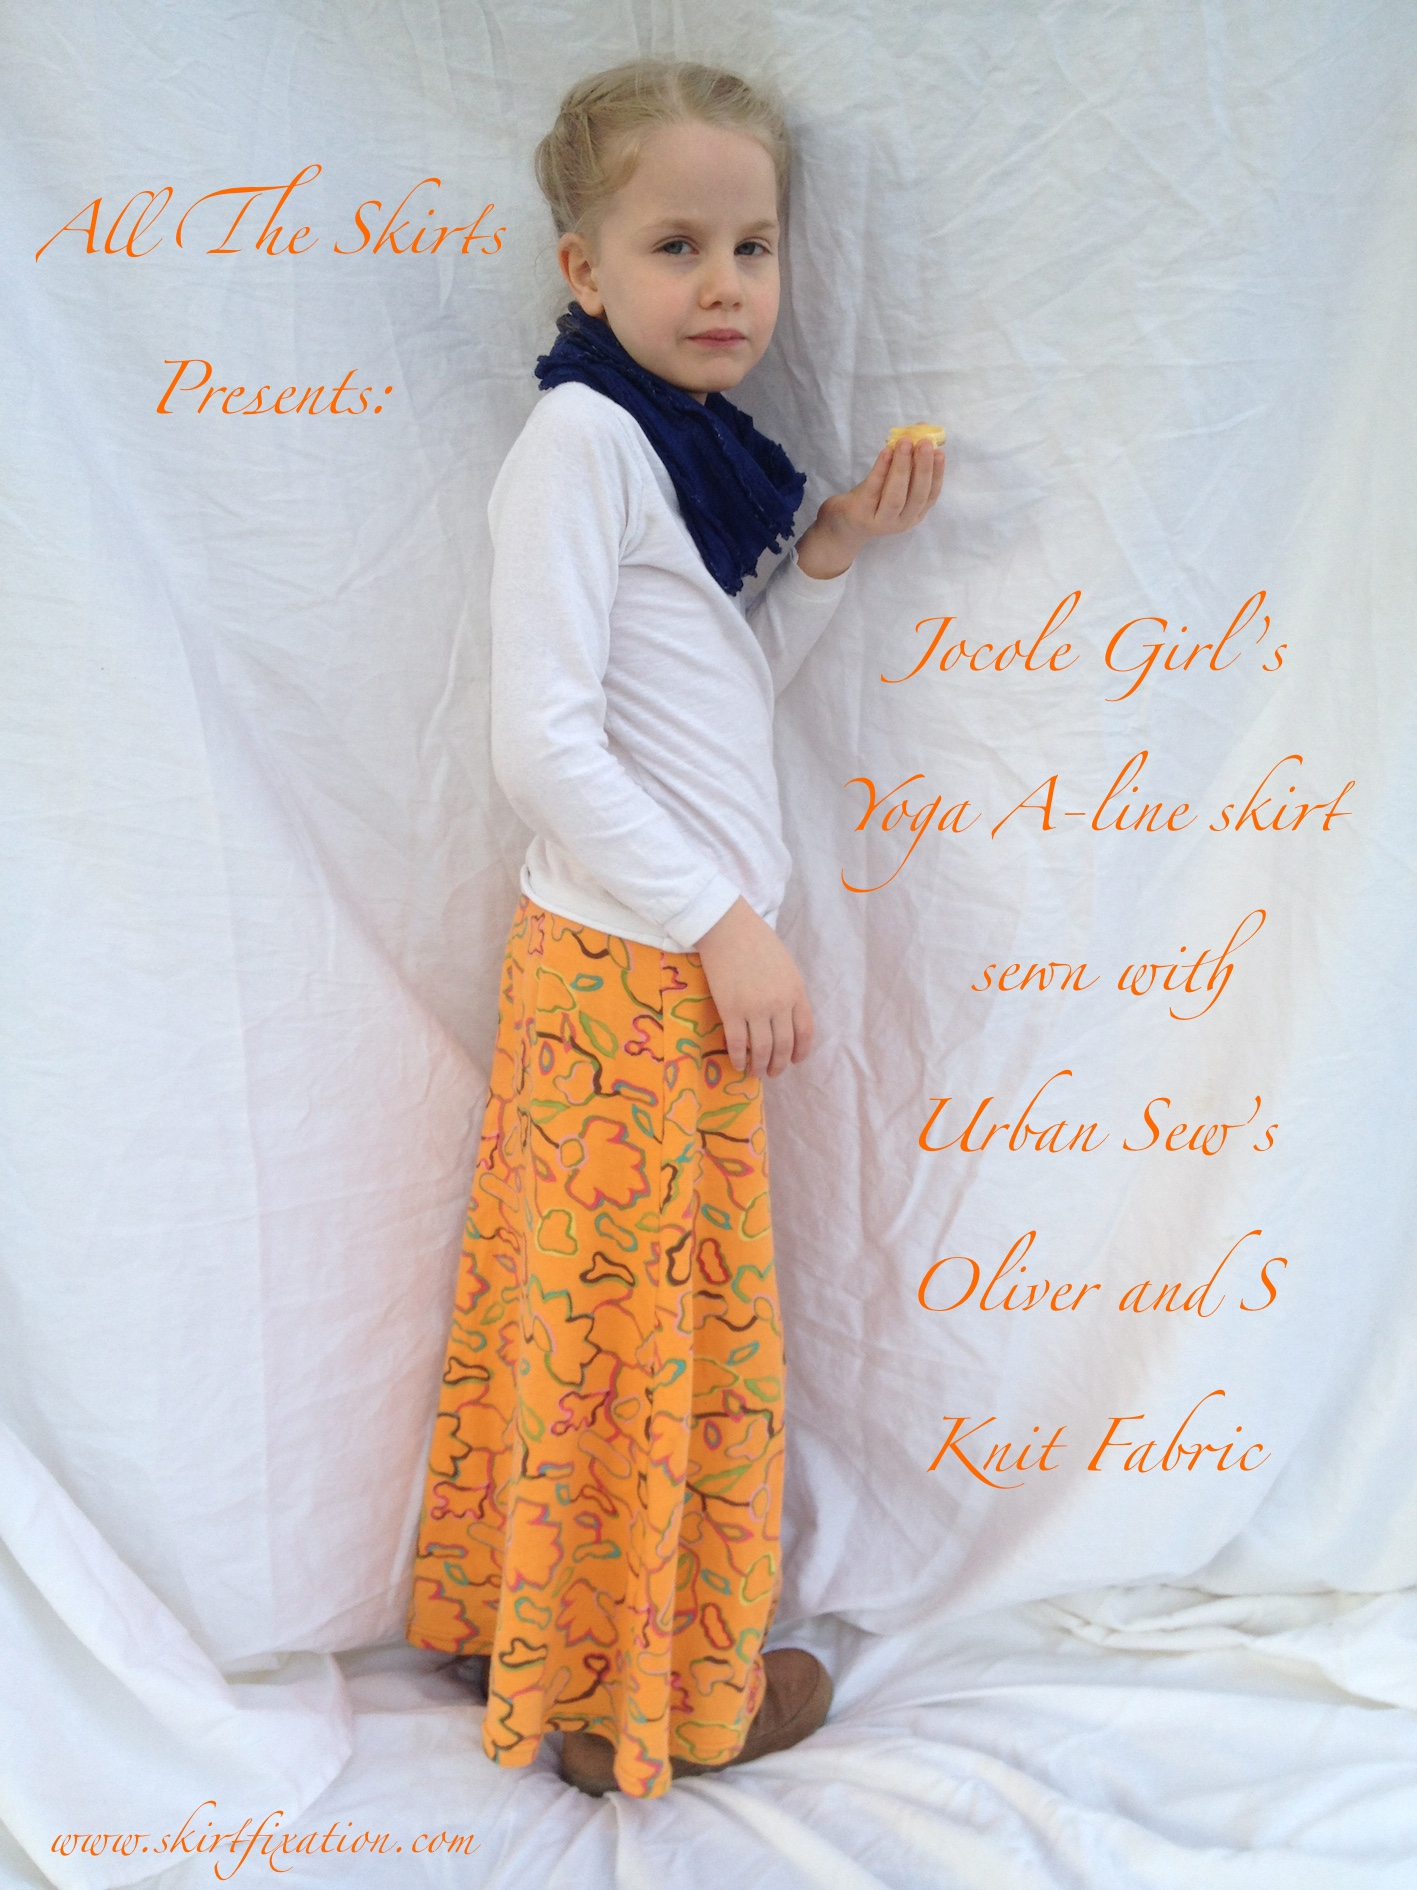 Jocole Yoga A-line Skirt sewn with Urban Sew fabric by Skirt Fixation